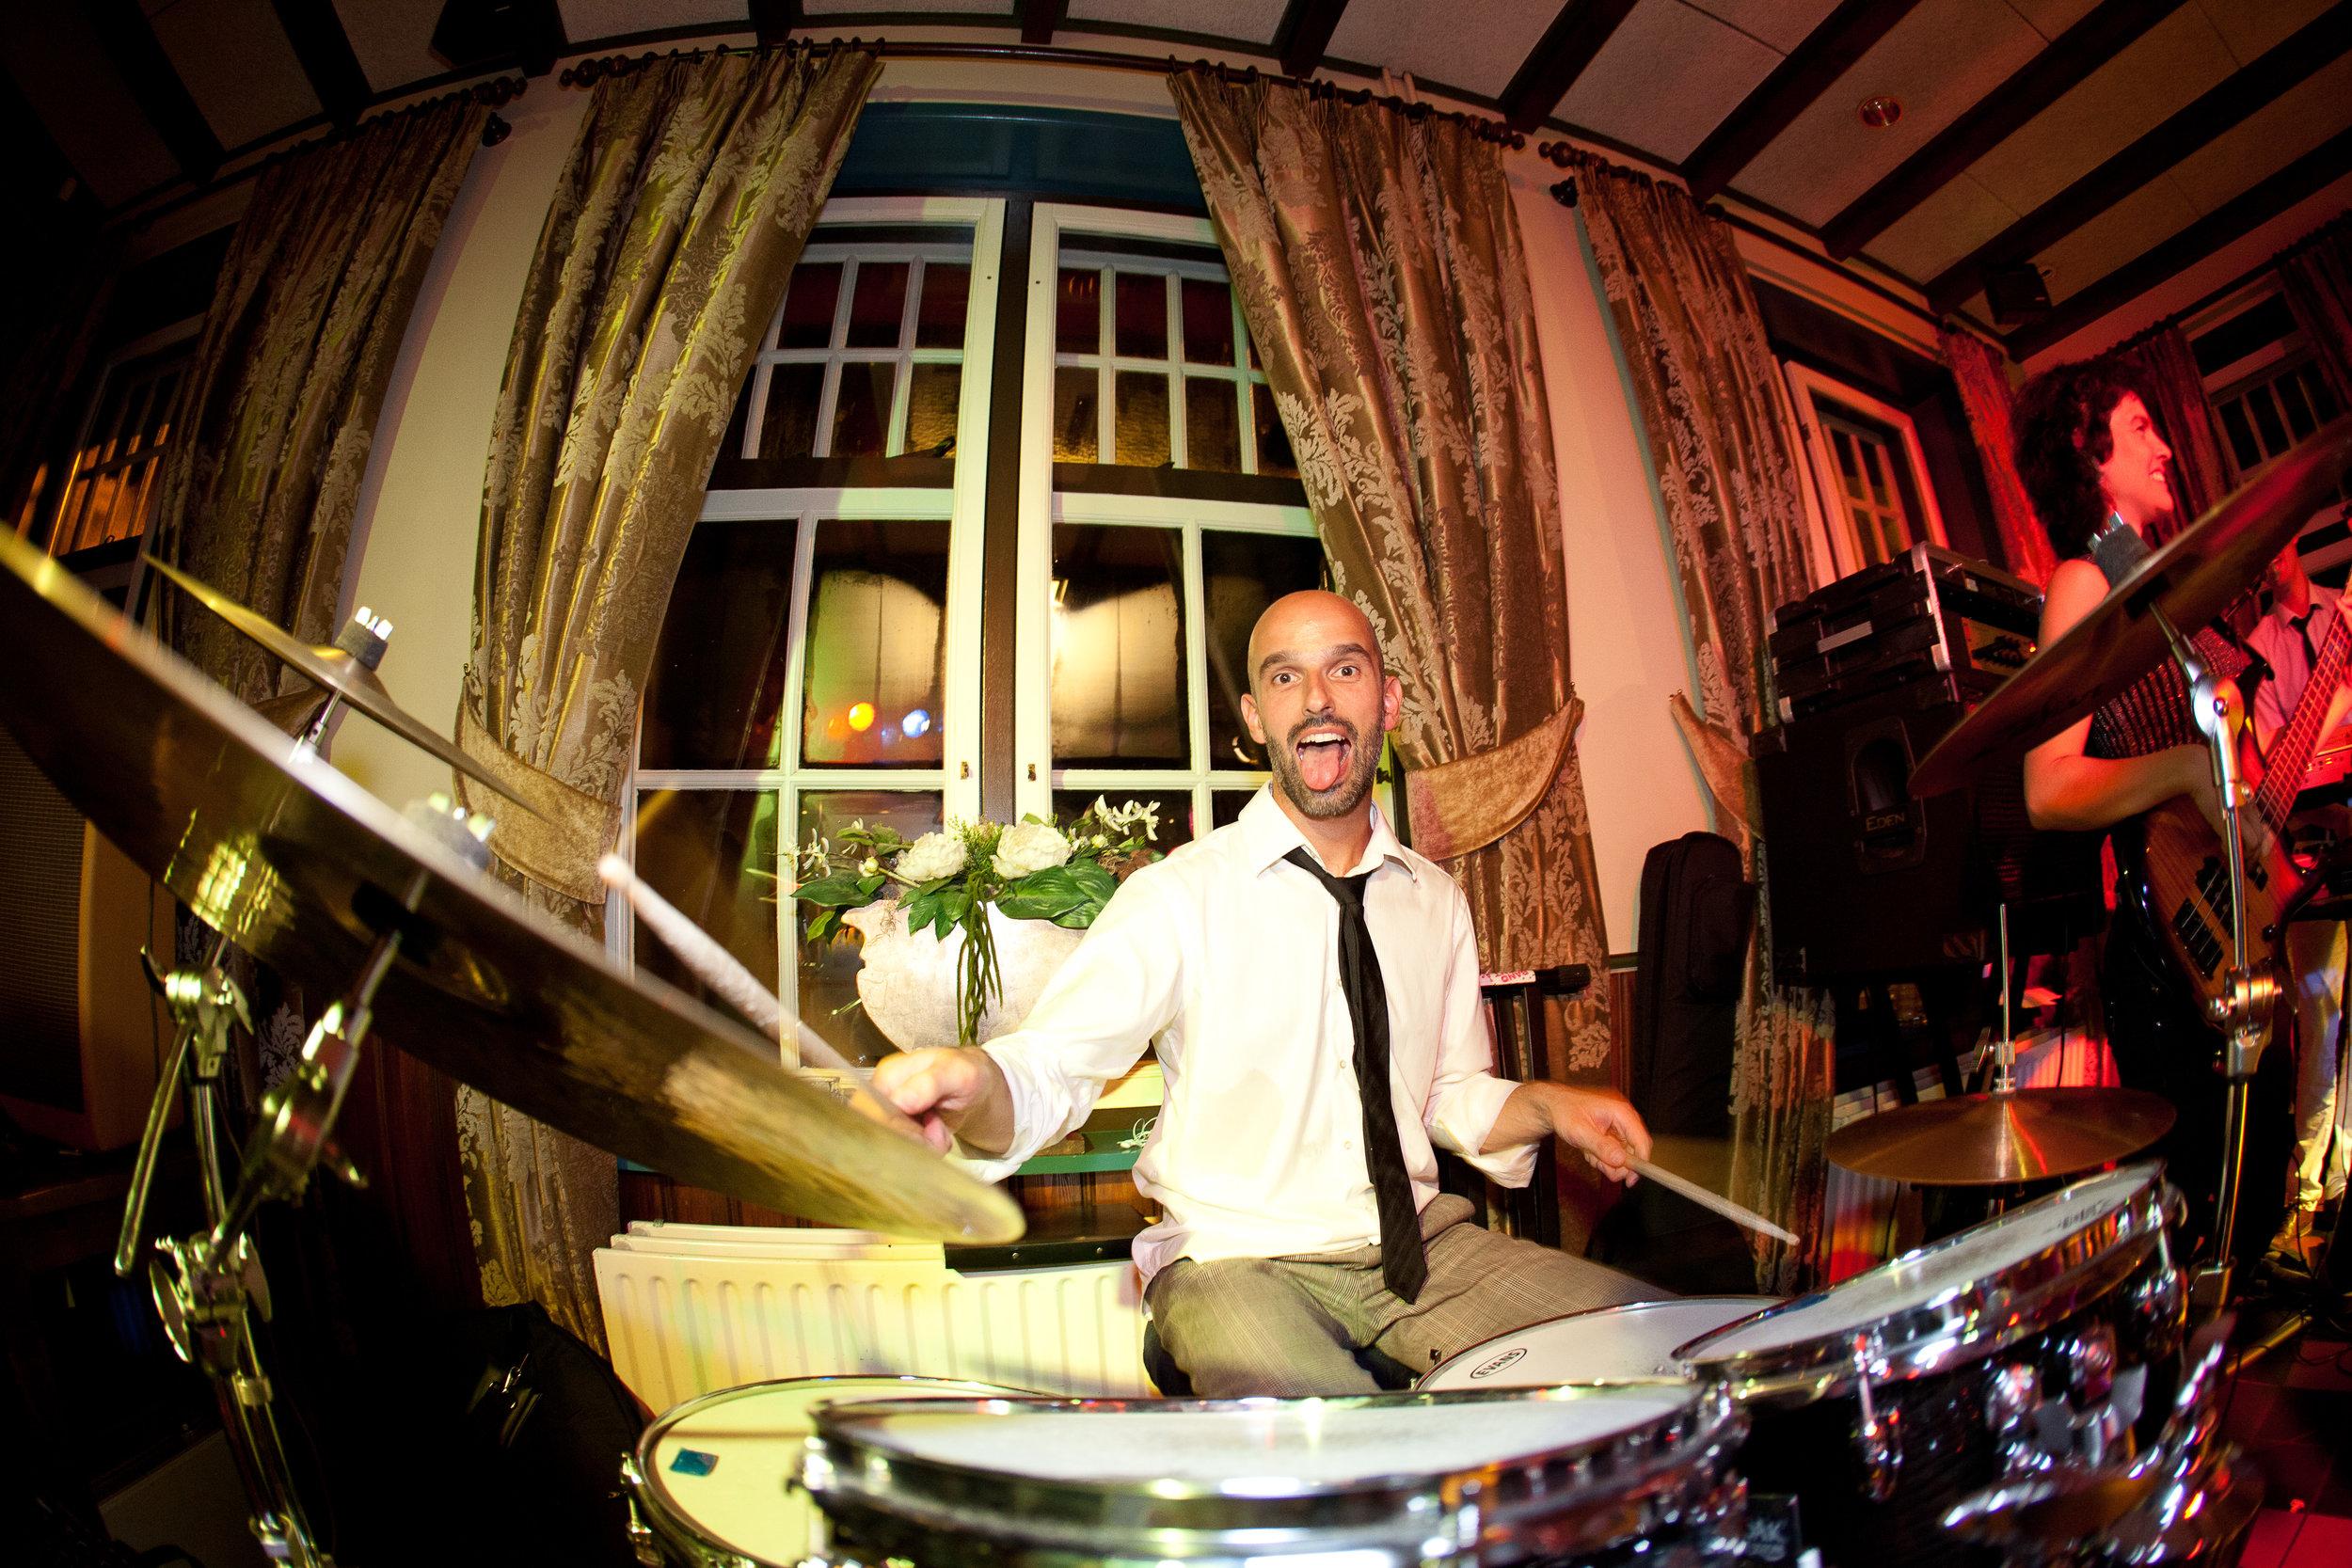 trouwshoot-bruidsfotografie-trouwfoto-feestfotografie-trouwreportage-Jan en Loes595.jpg